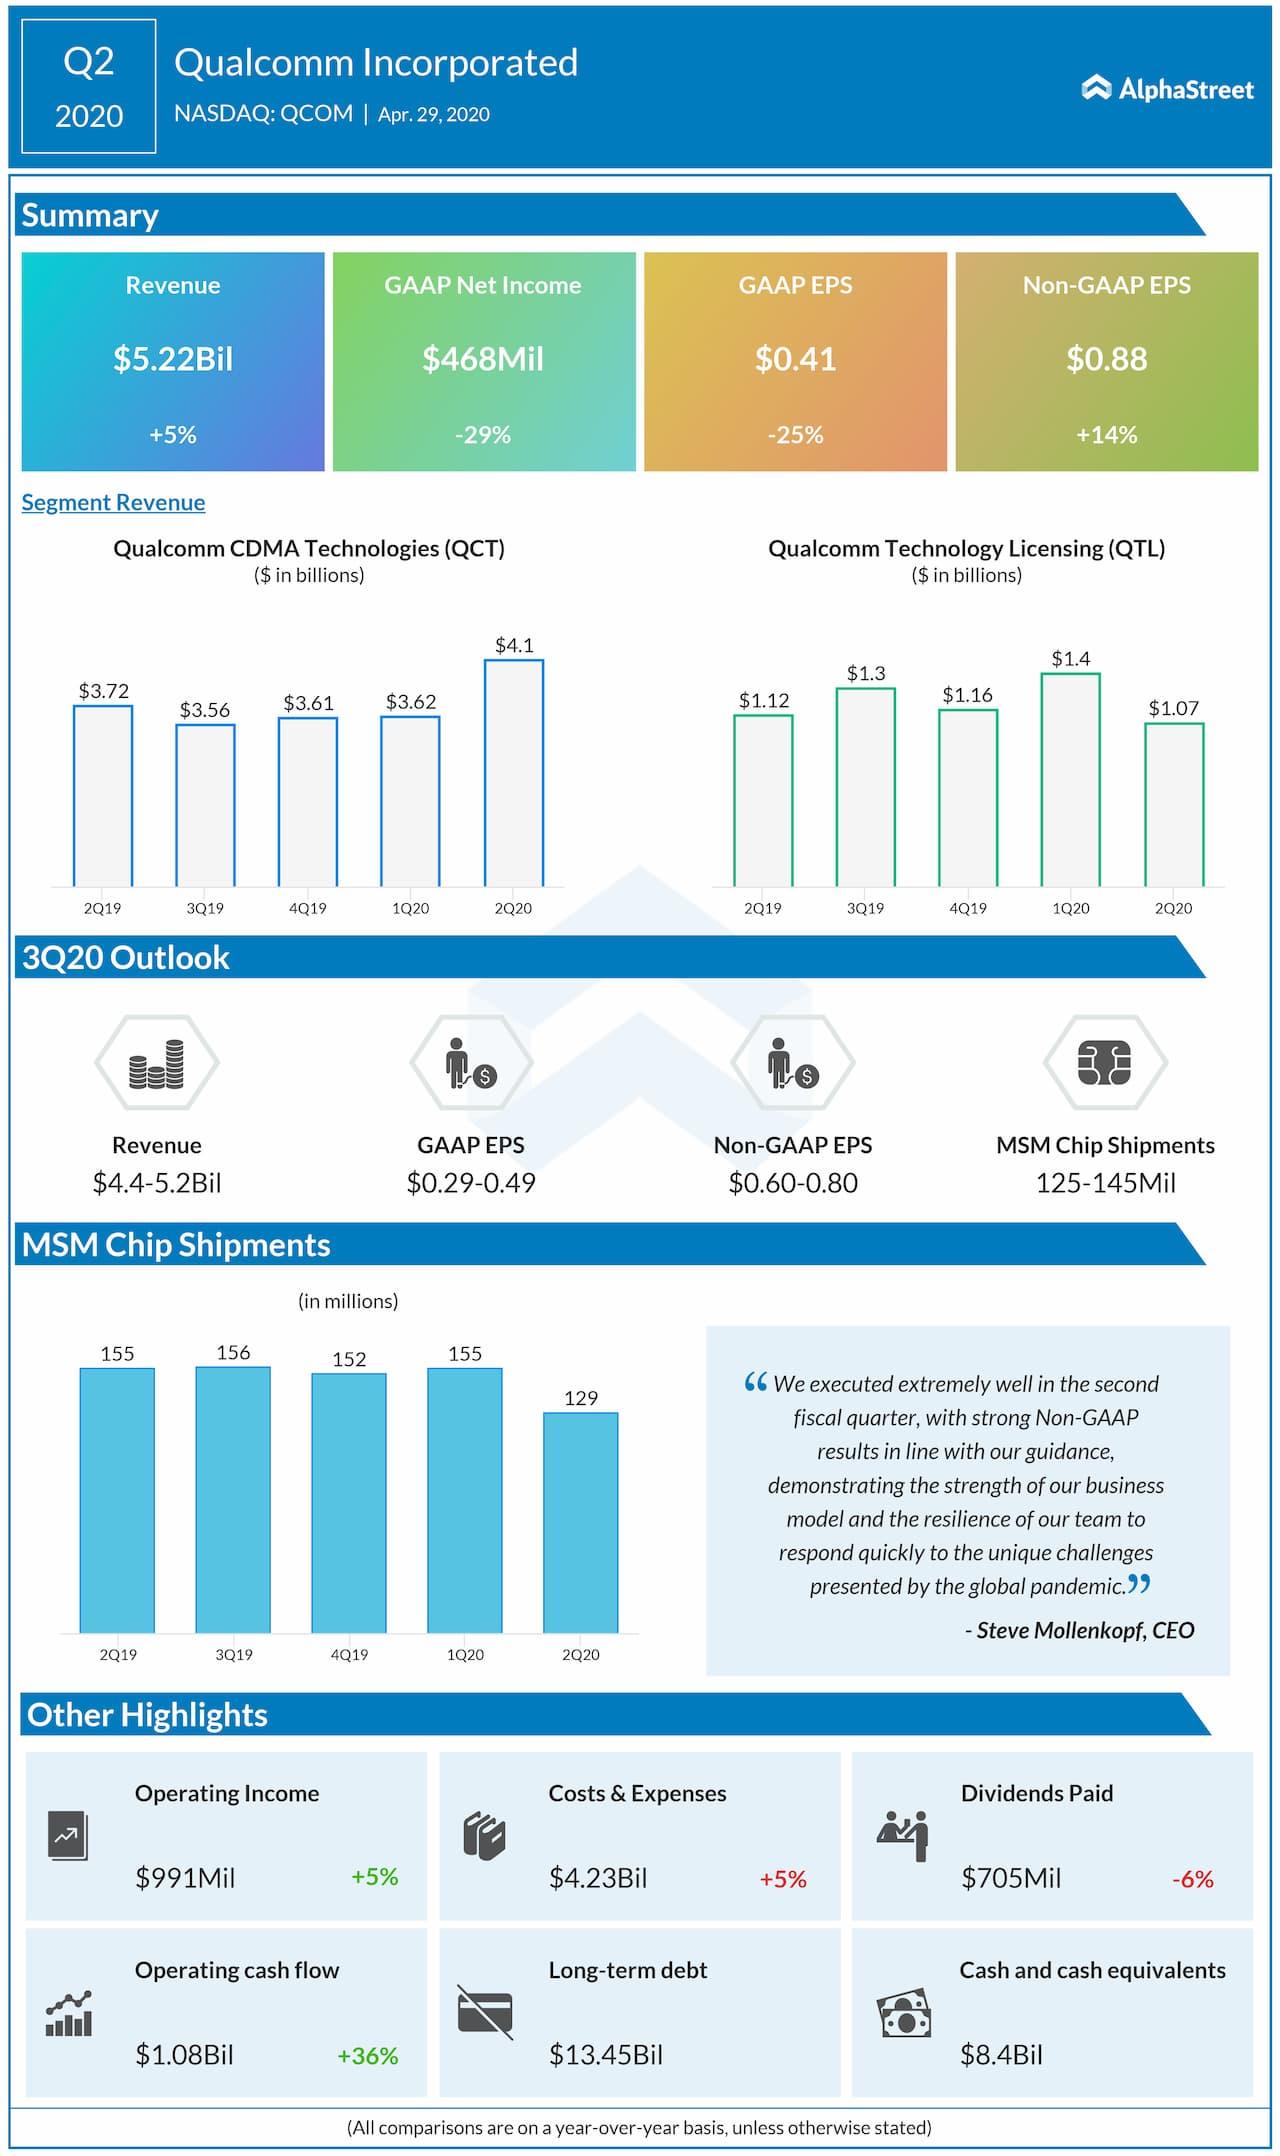 Qualcomm (QCOM) Q2 2020 earnings review